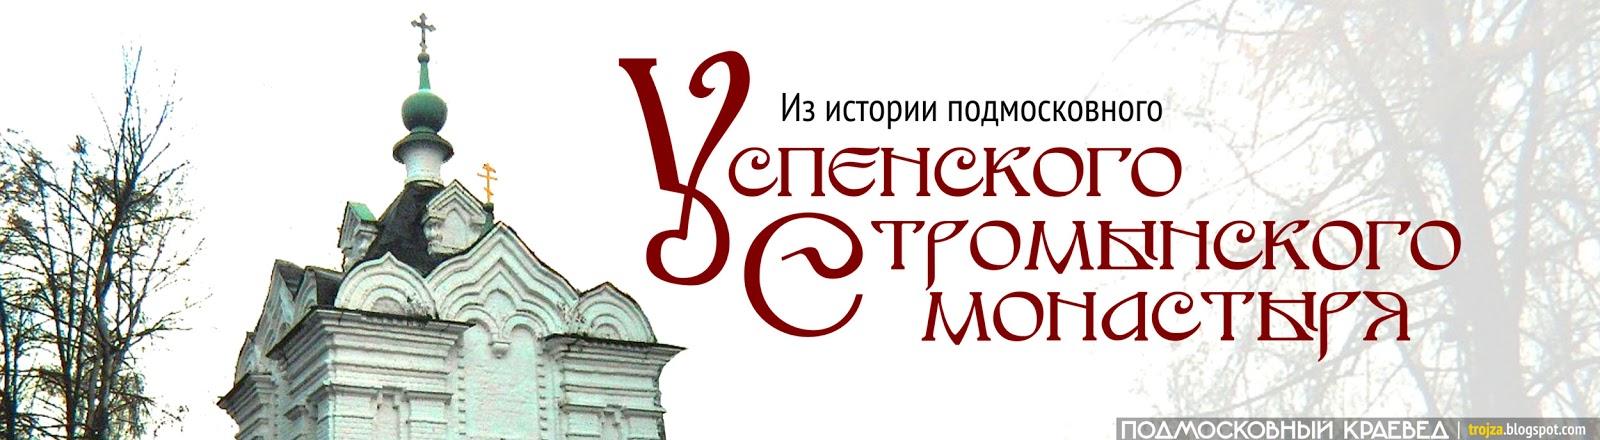 ЕгорКадастр Егорьевск